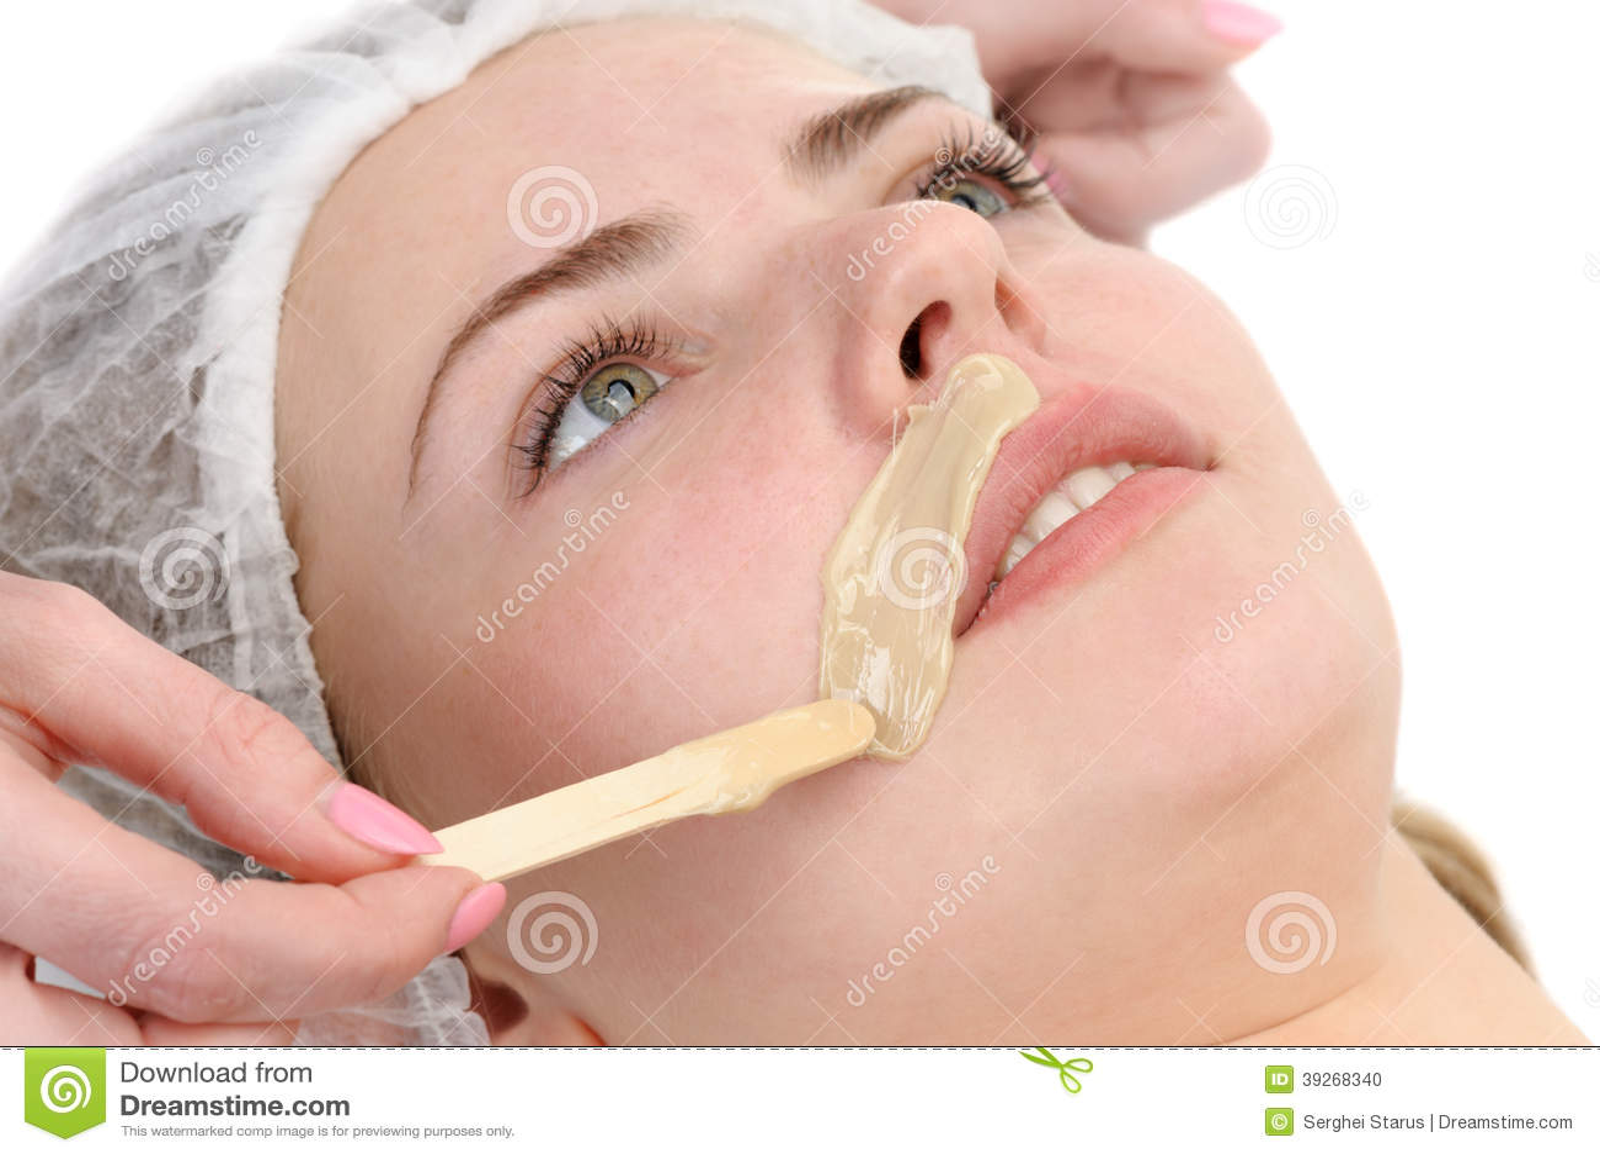 Depilation Mustache